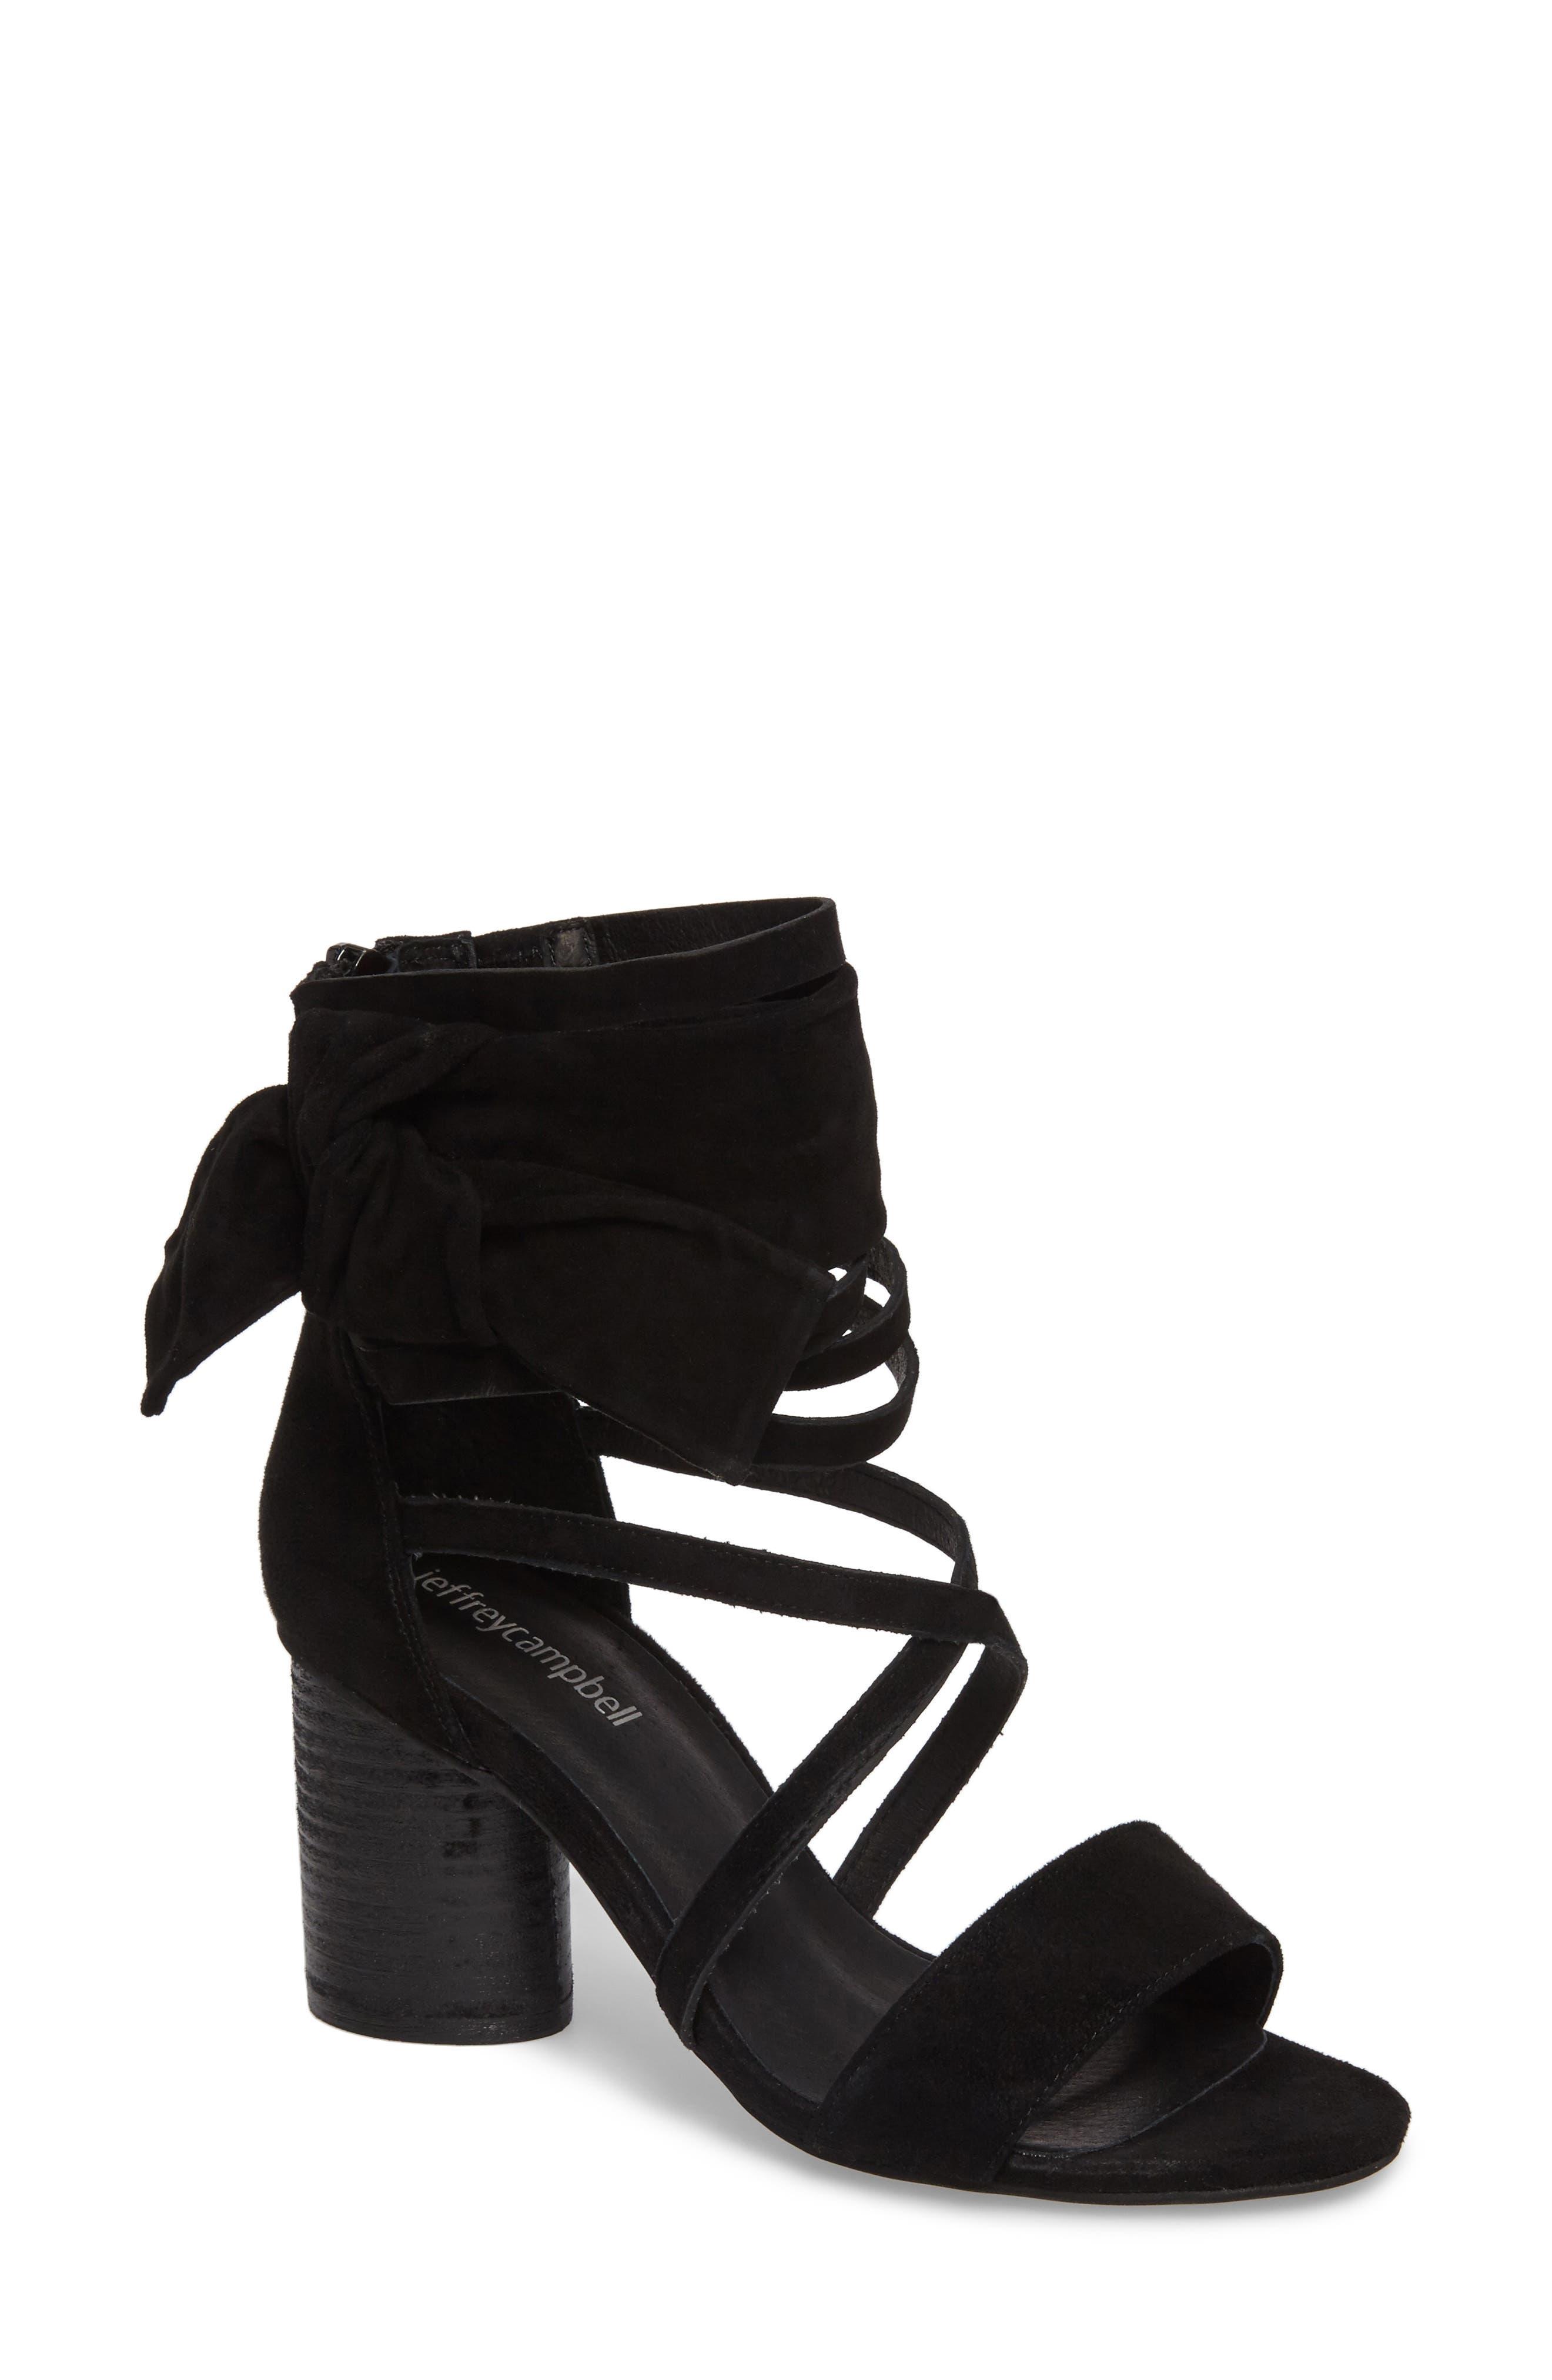 Destini Ankle Cuff Sandal,                         Main,                         color, 005